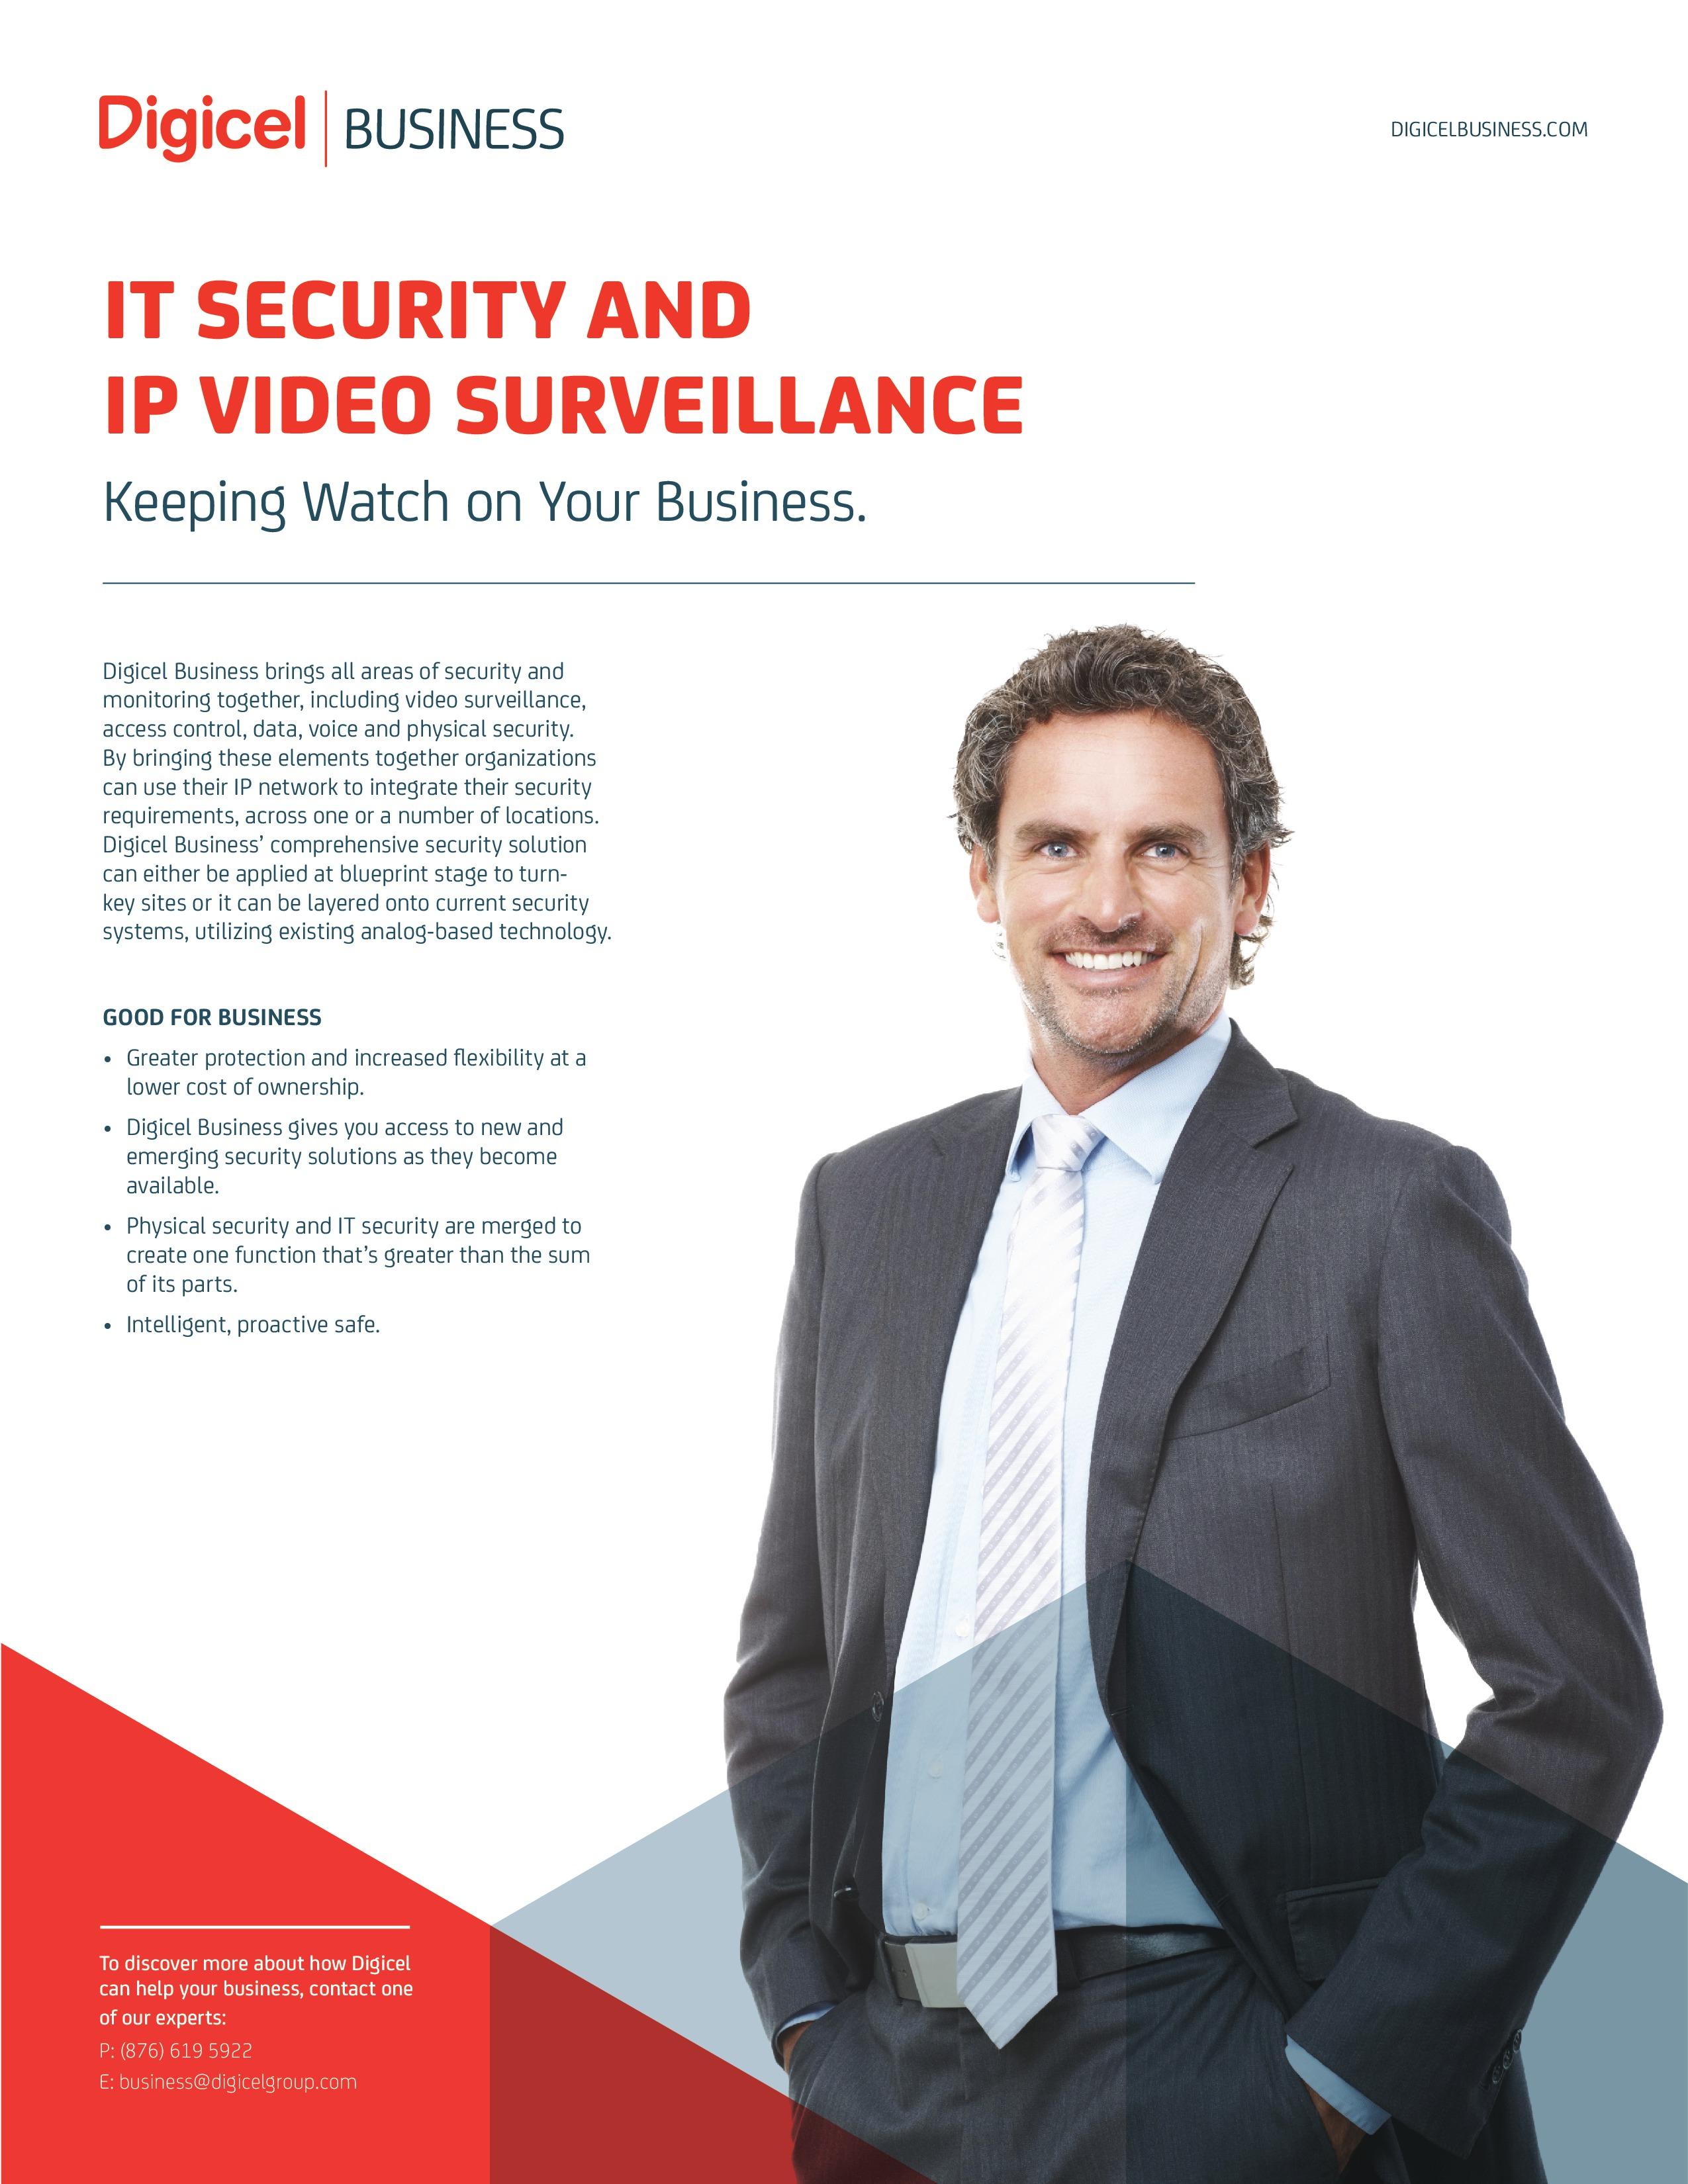 IT Surveillance and IP Video Surveillance